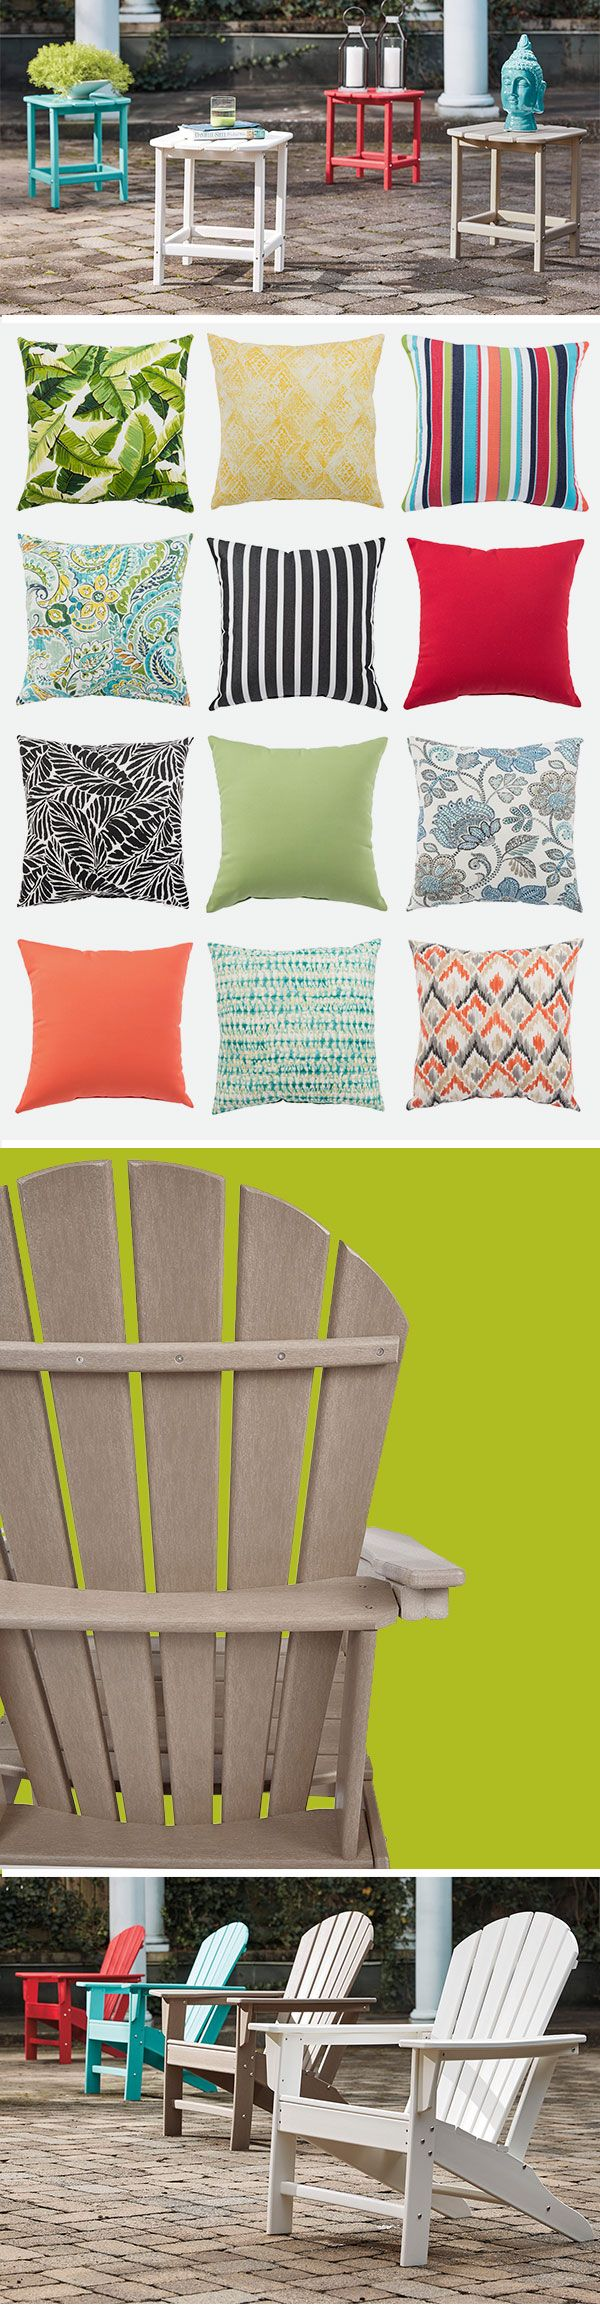 patio perfect ideas patio furniture